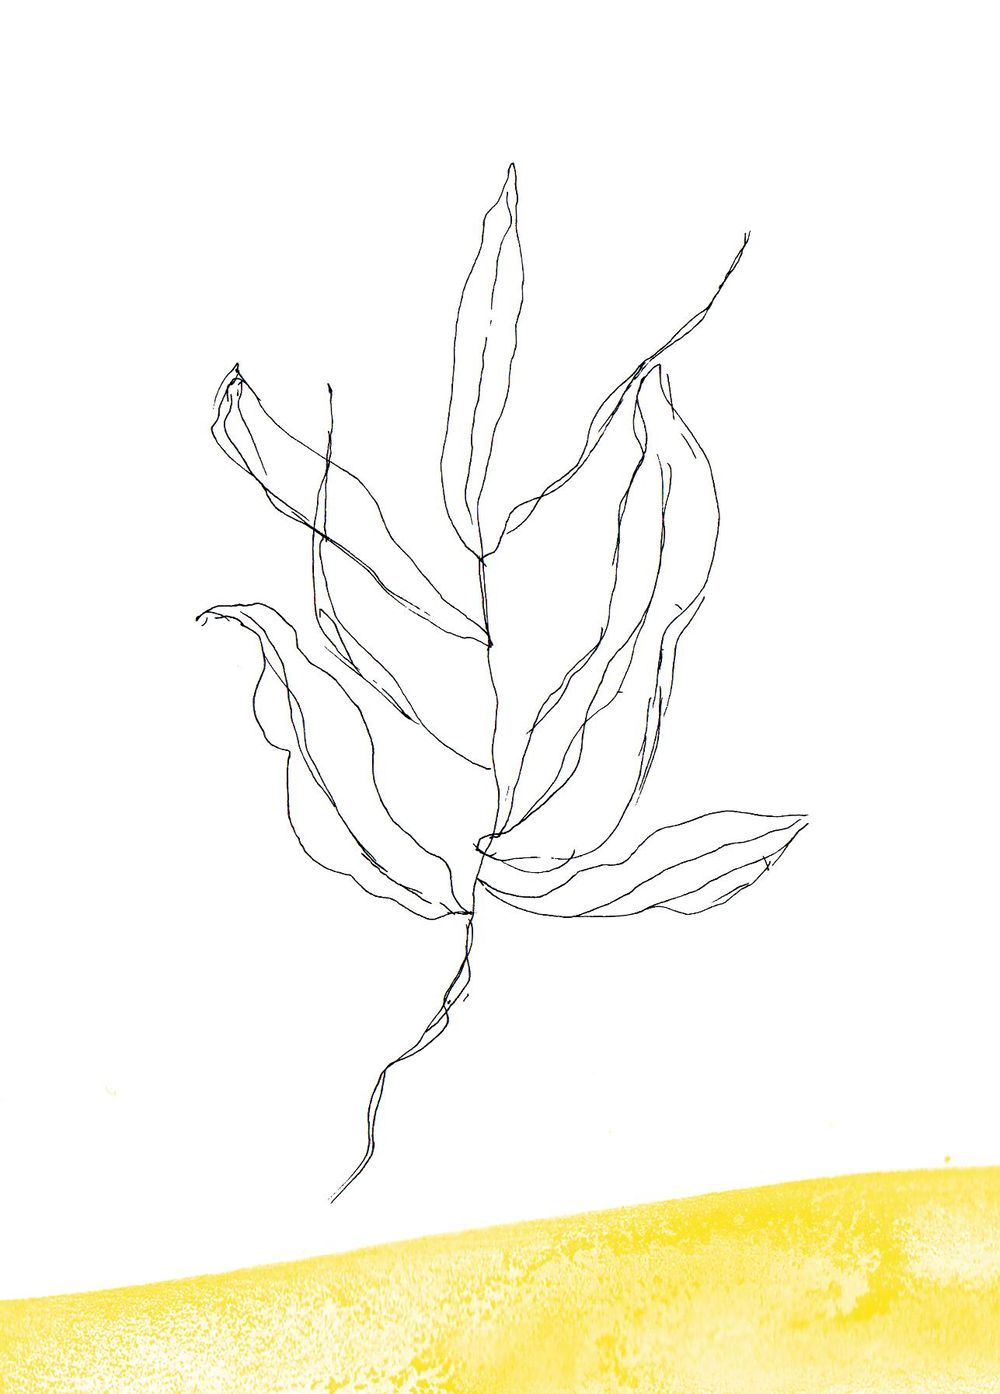 Botanical - image 3 - student project